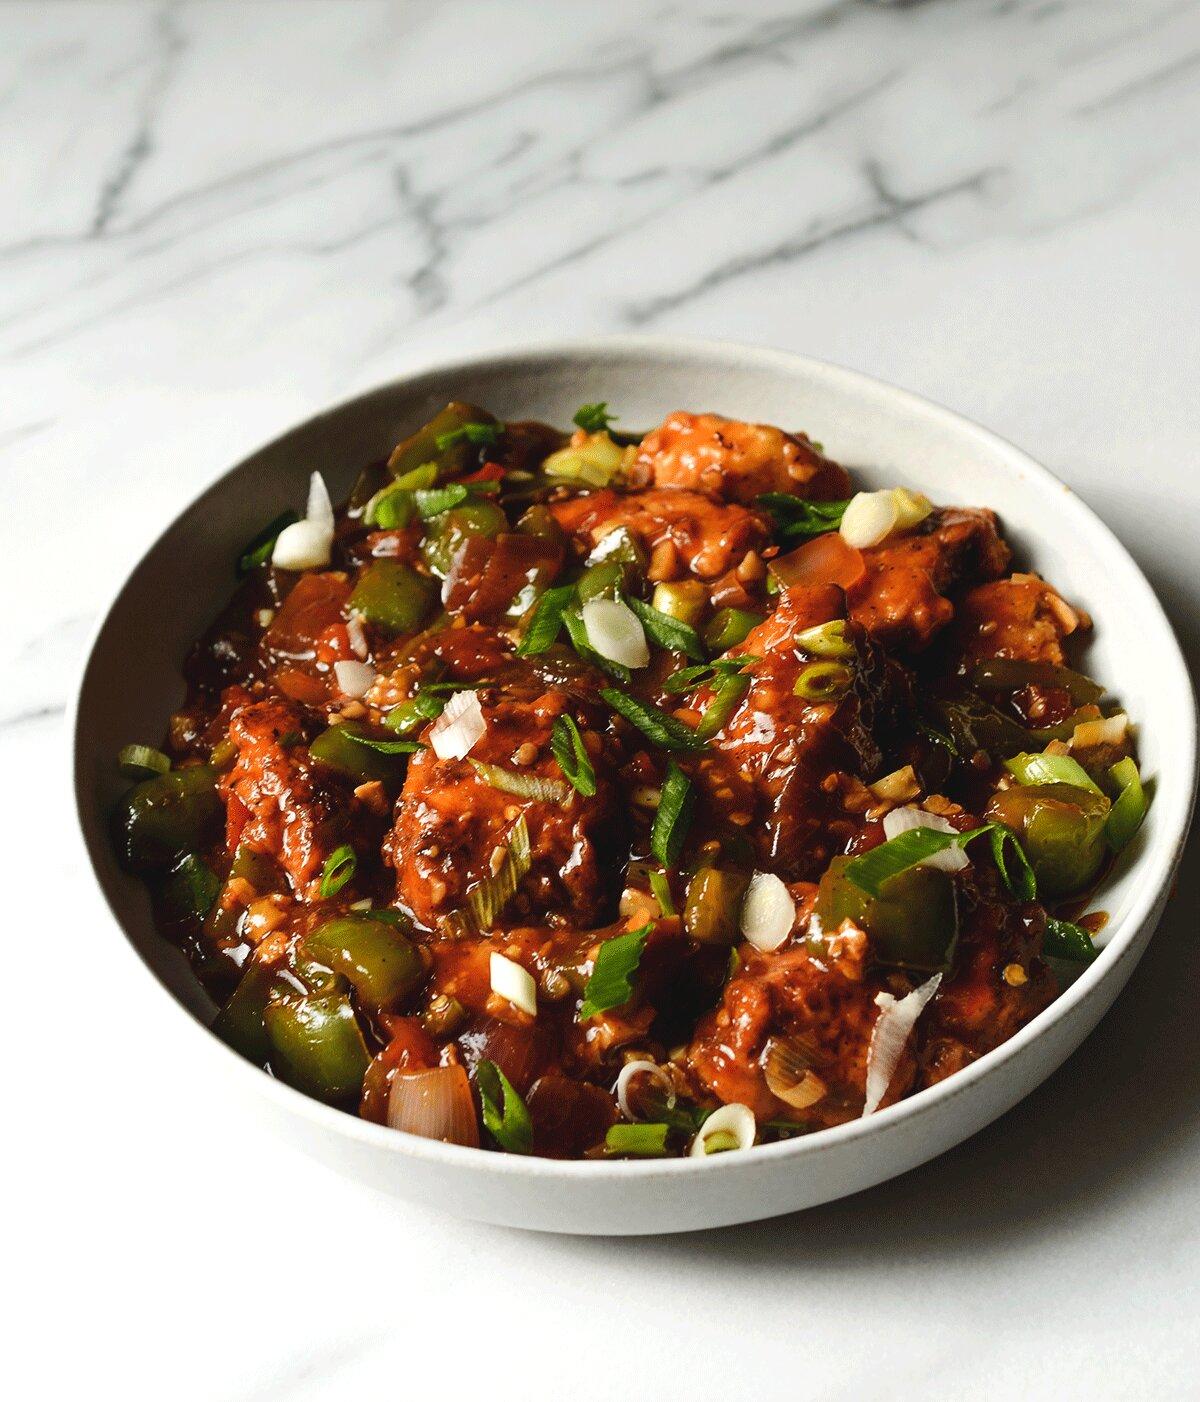 Restaurant Style Chili Chicken Gravy Not A Curry